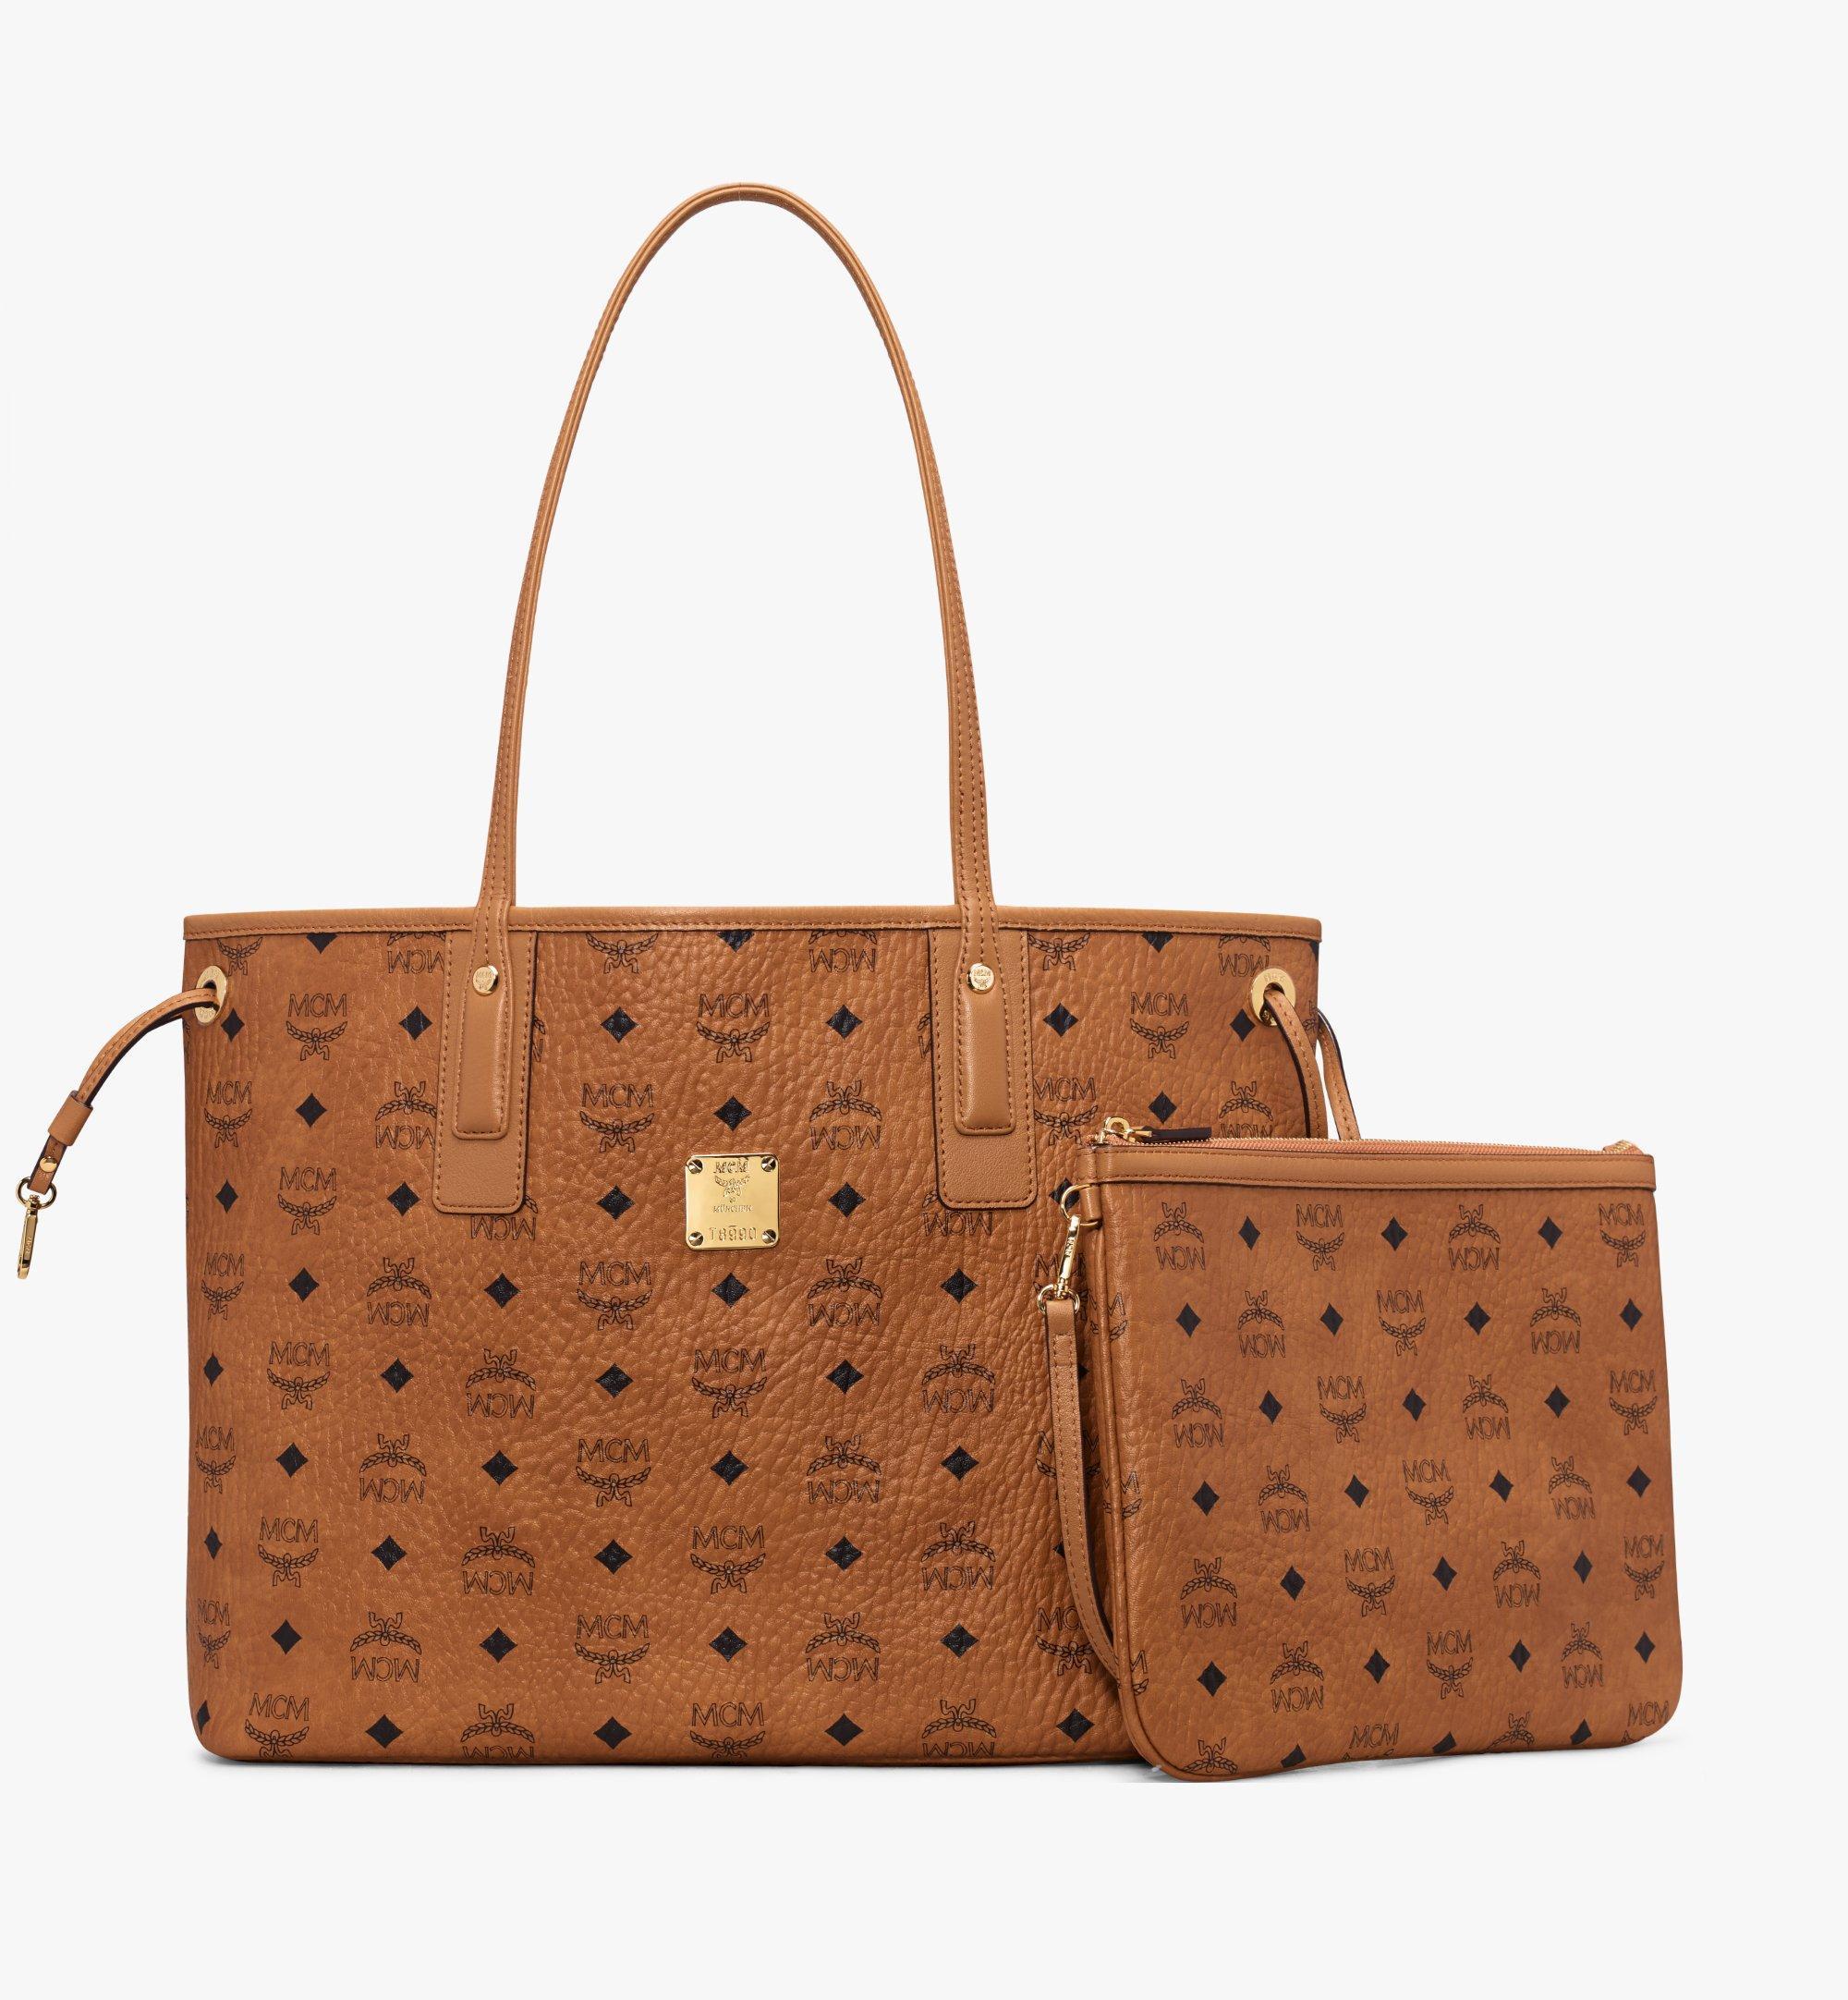 Medium Liz Shopper in Visetos Cognac | MCM® DE